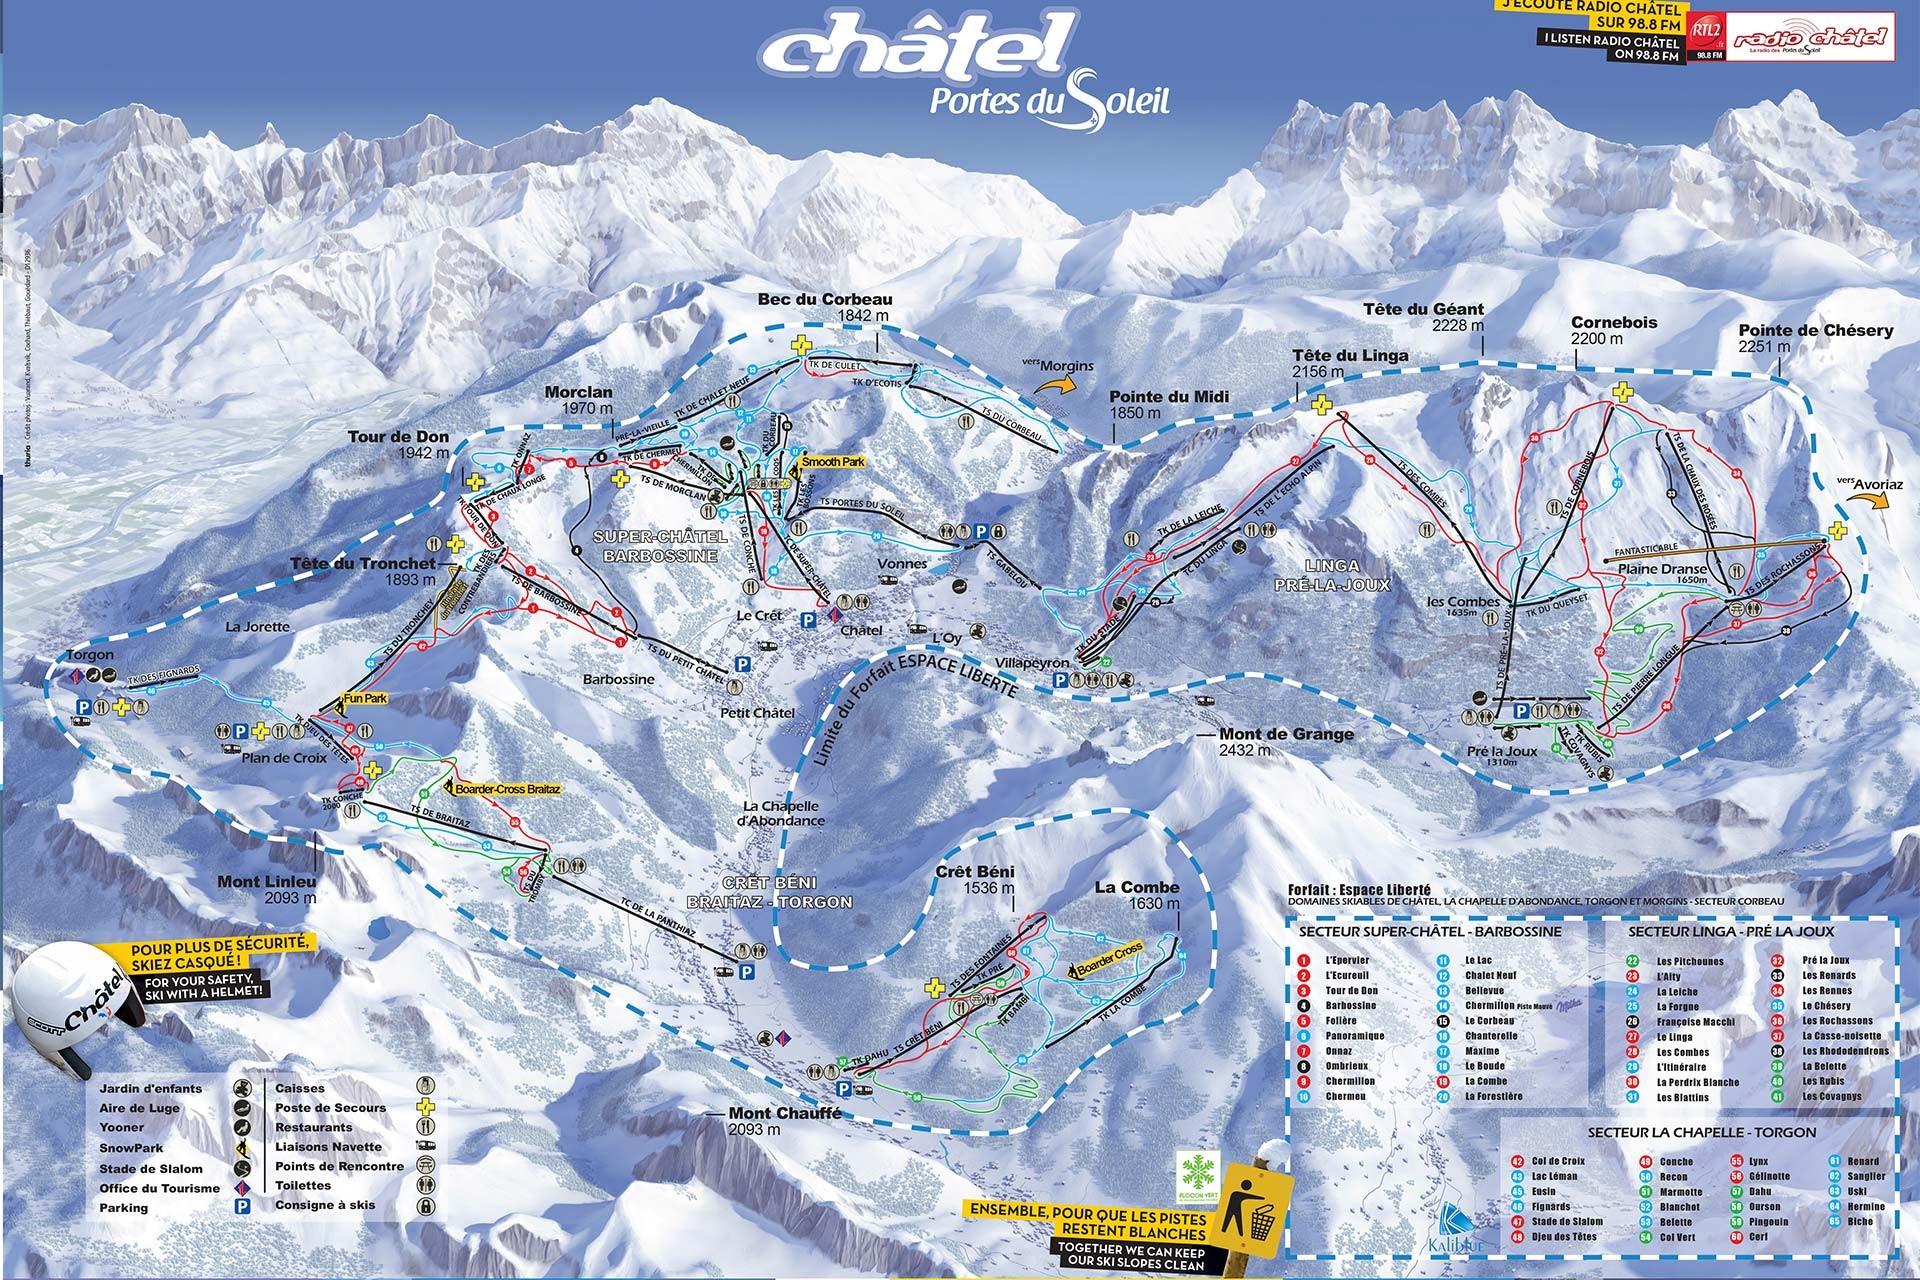 Ski maps